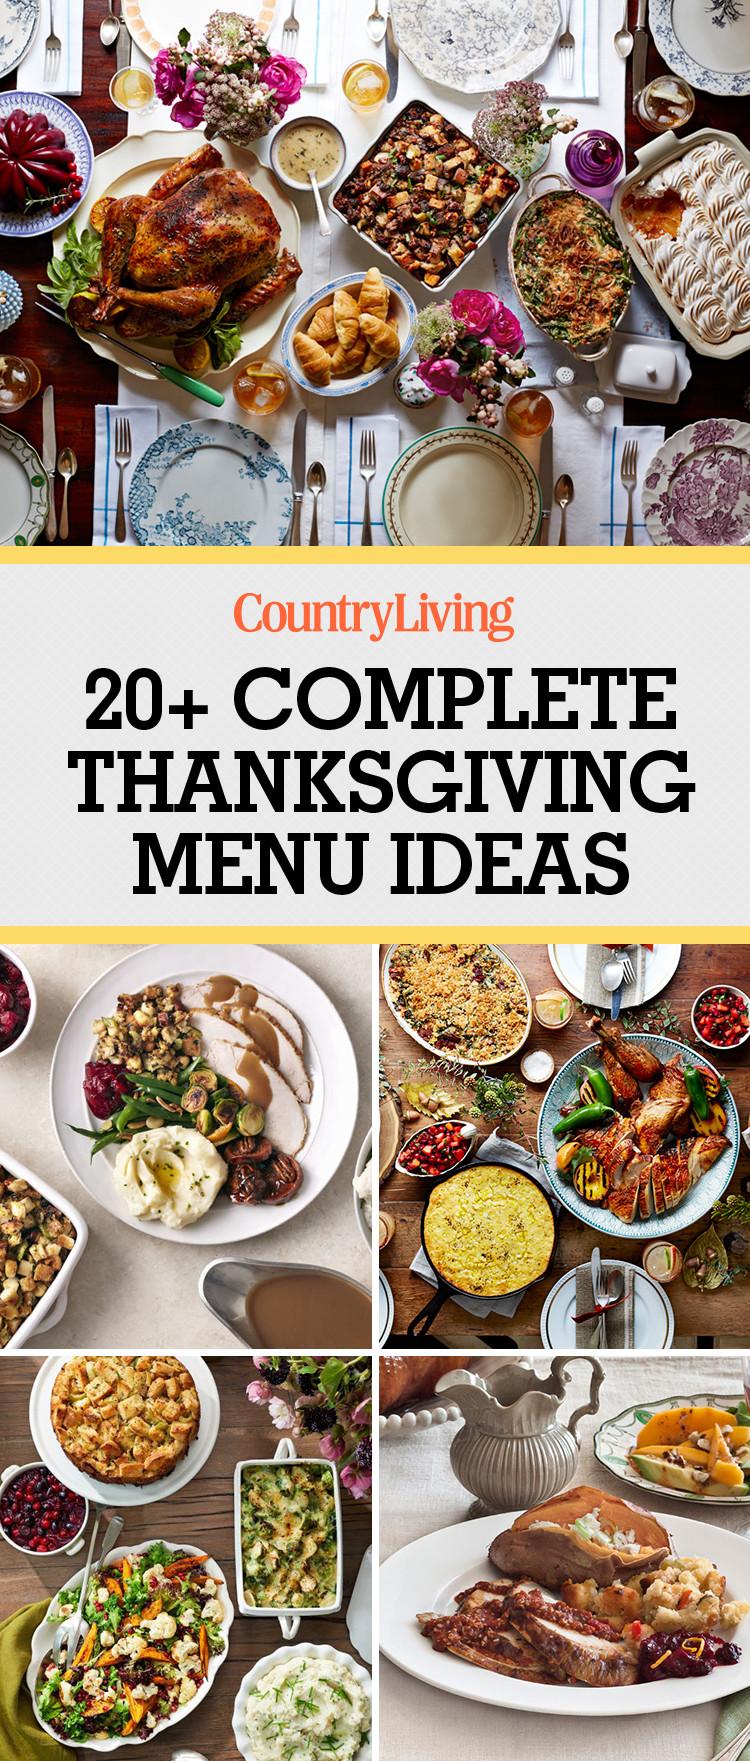 Thanksgiving Dinner Menu Ideas  26 Thanksgiving Menu Ideas Thanksgiving Dinner Menu Recipes